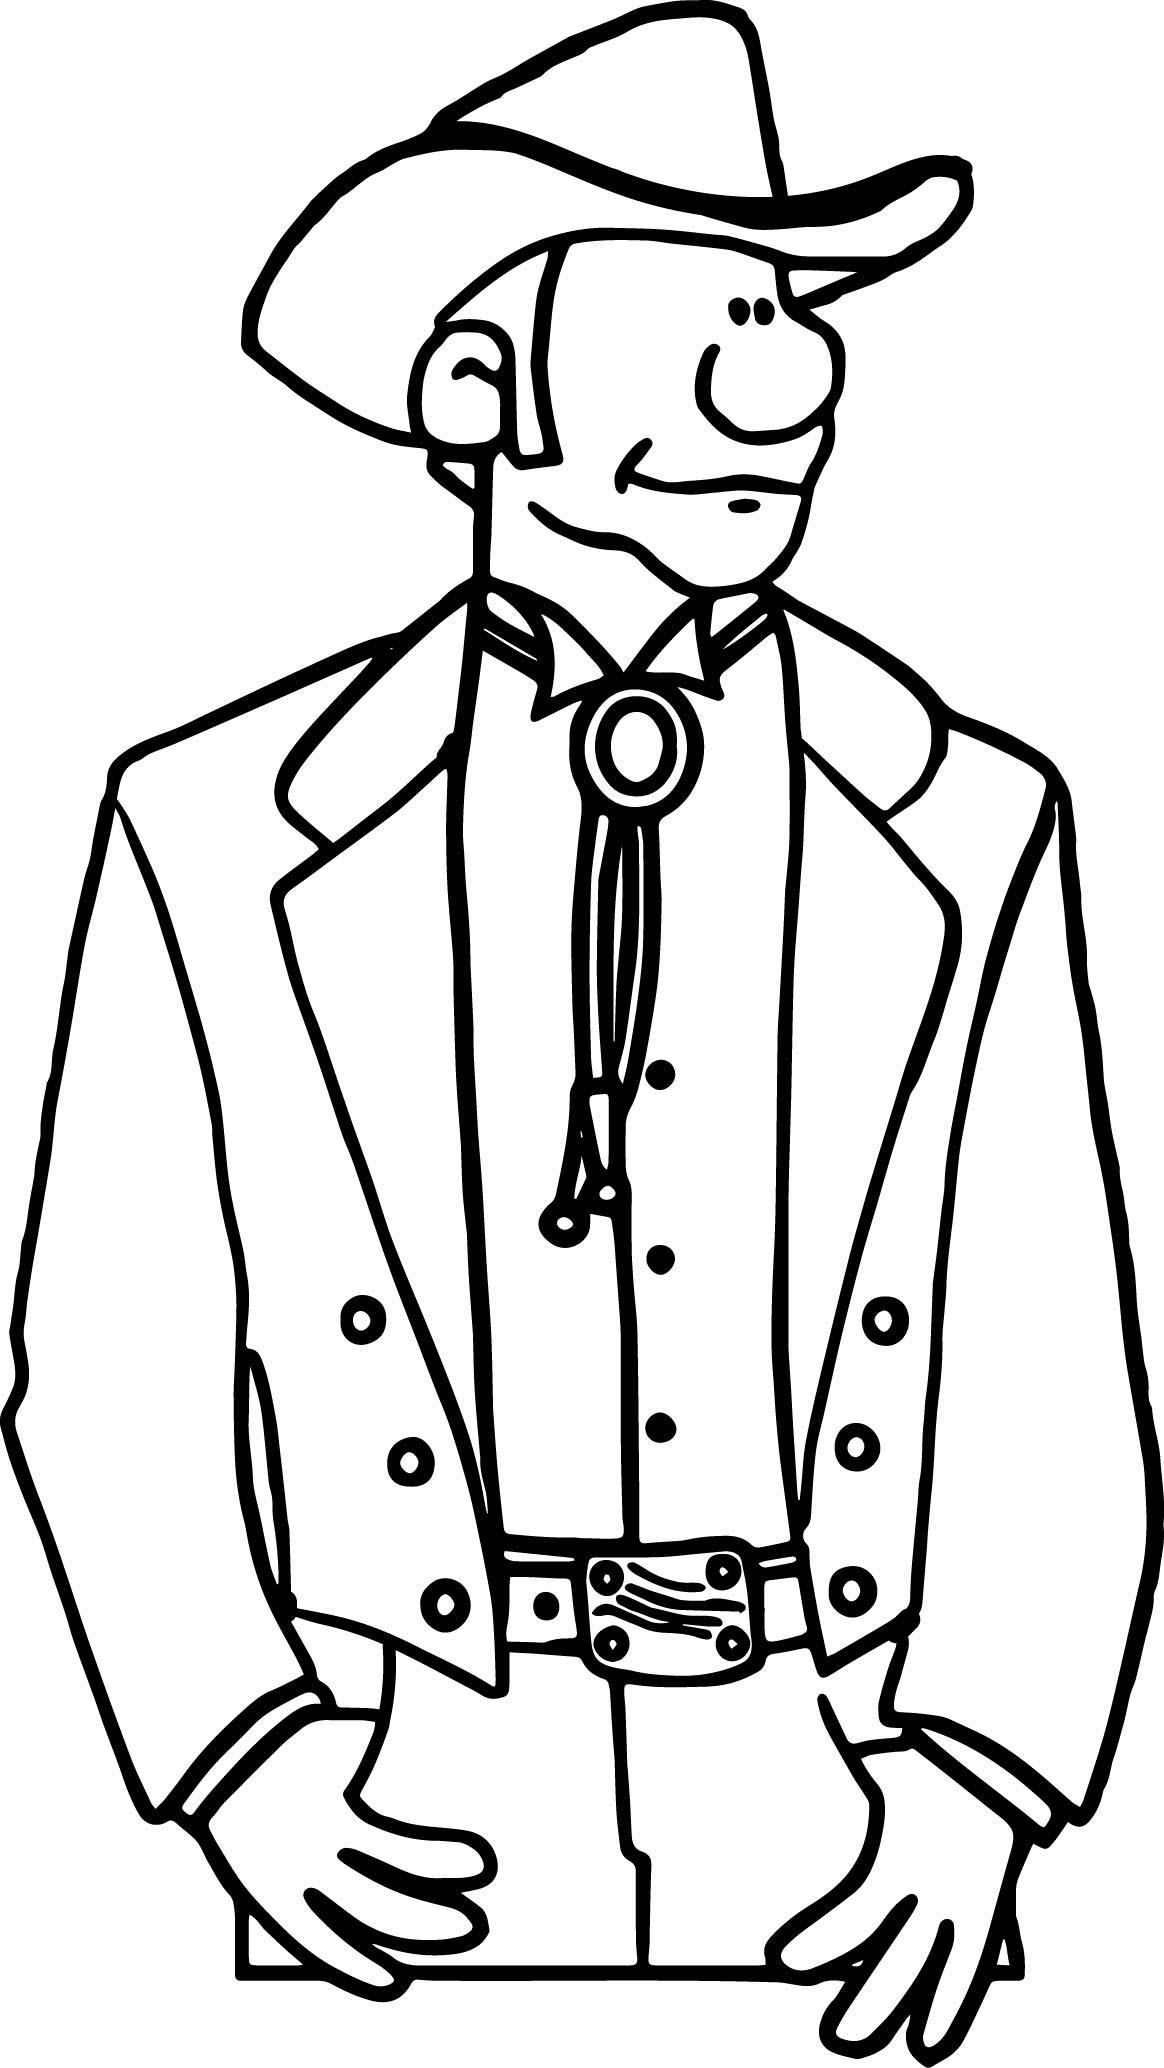 Arizona Bolo Man Coloring Page